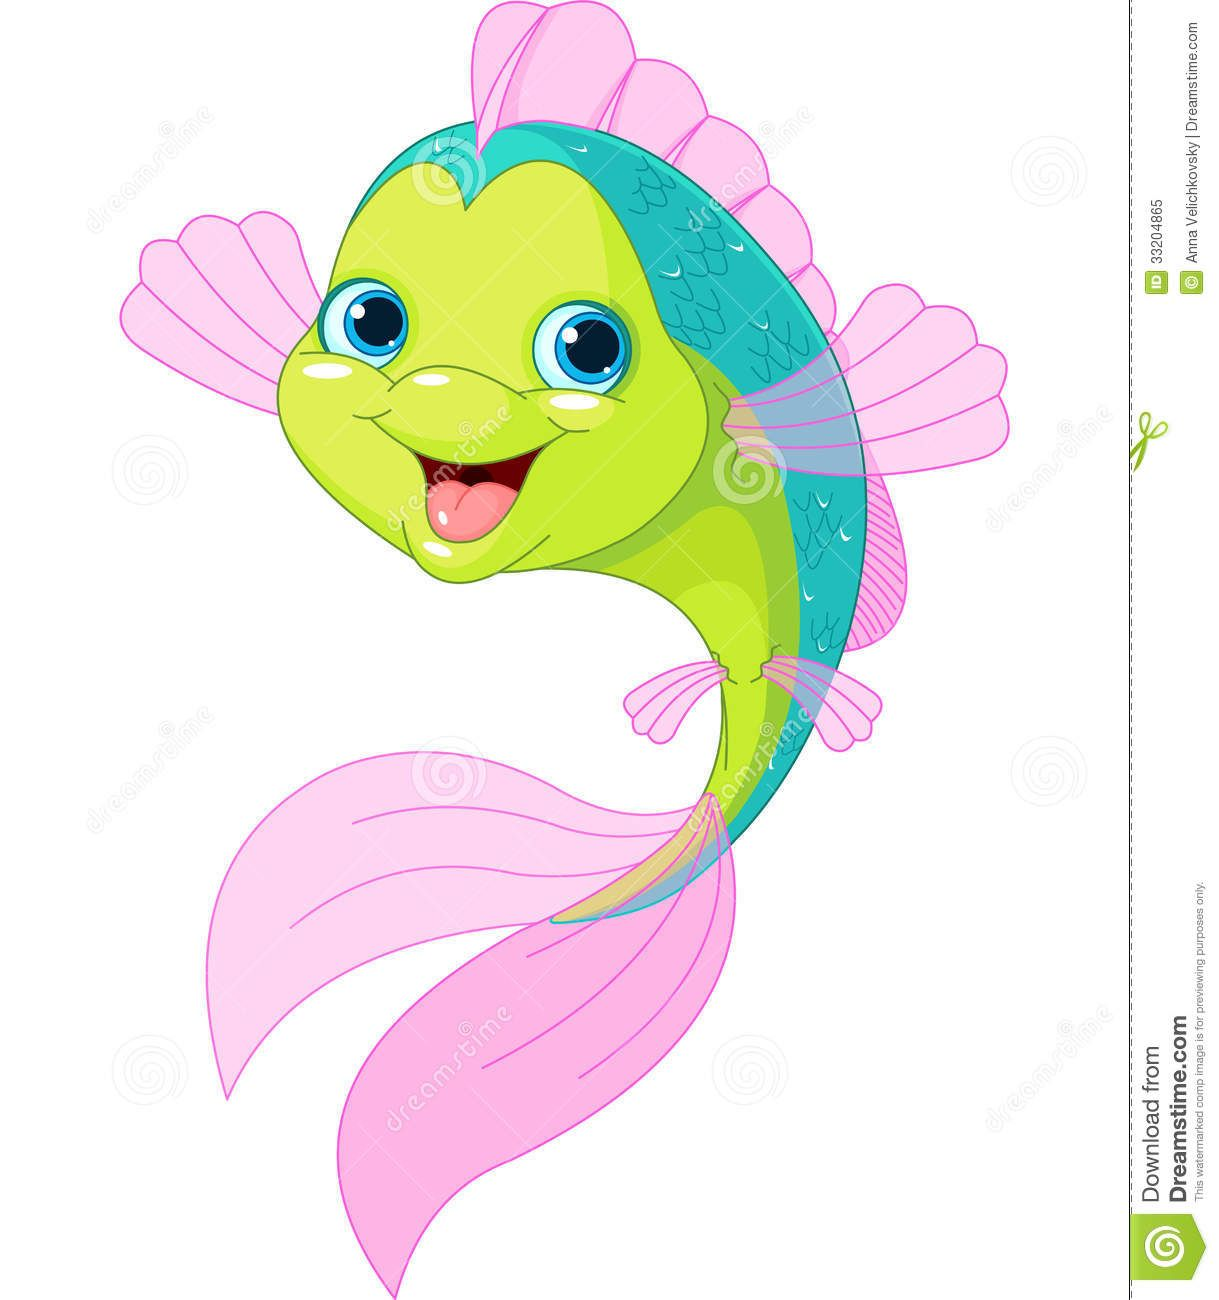 Cute Fish Cartoon Auto Design Tech Cute Cartoon Fish Cartoon Fish Cute Fish